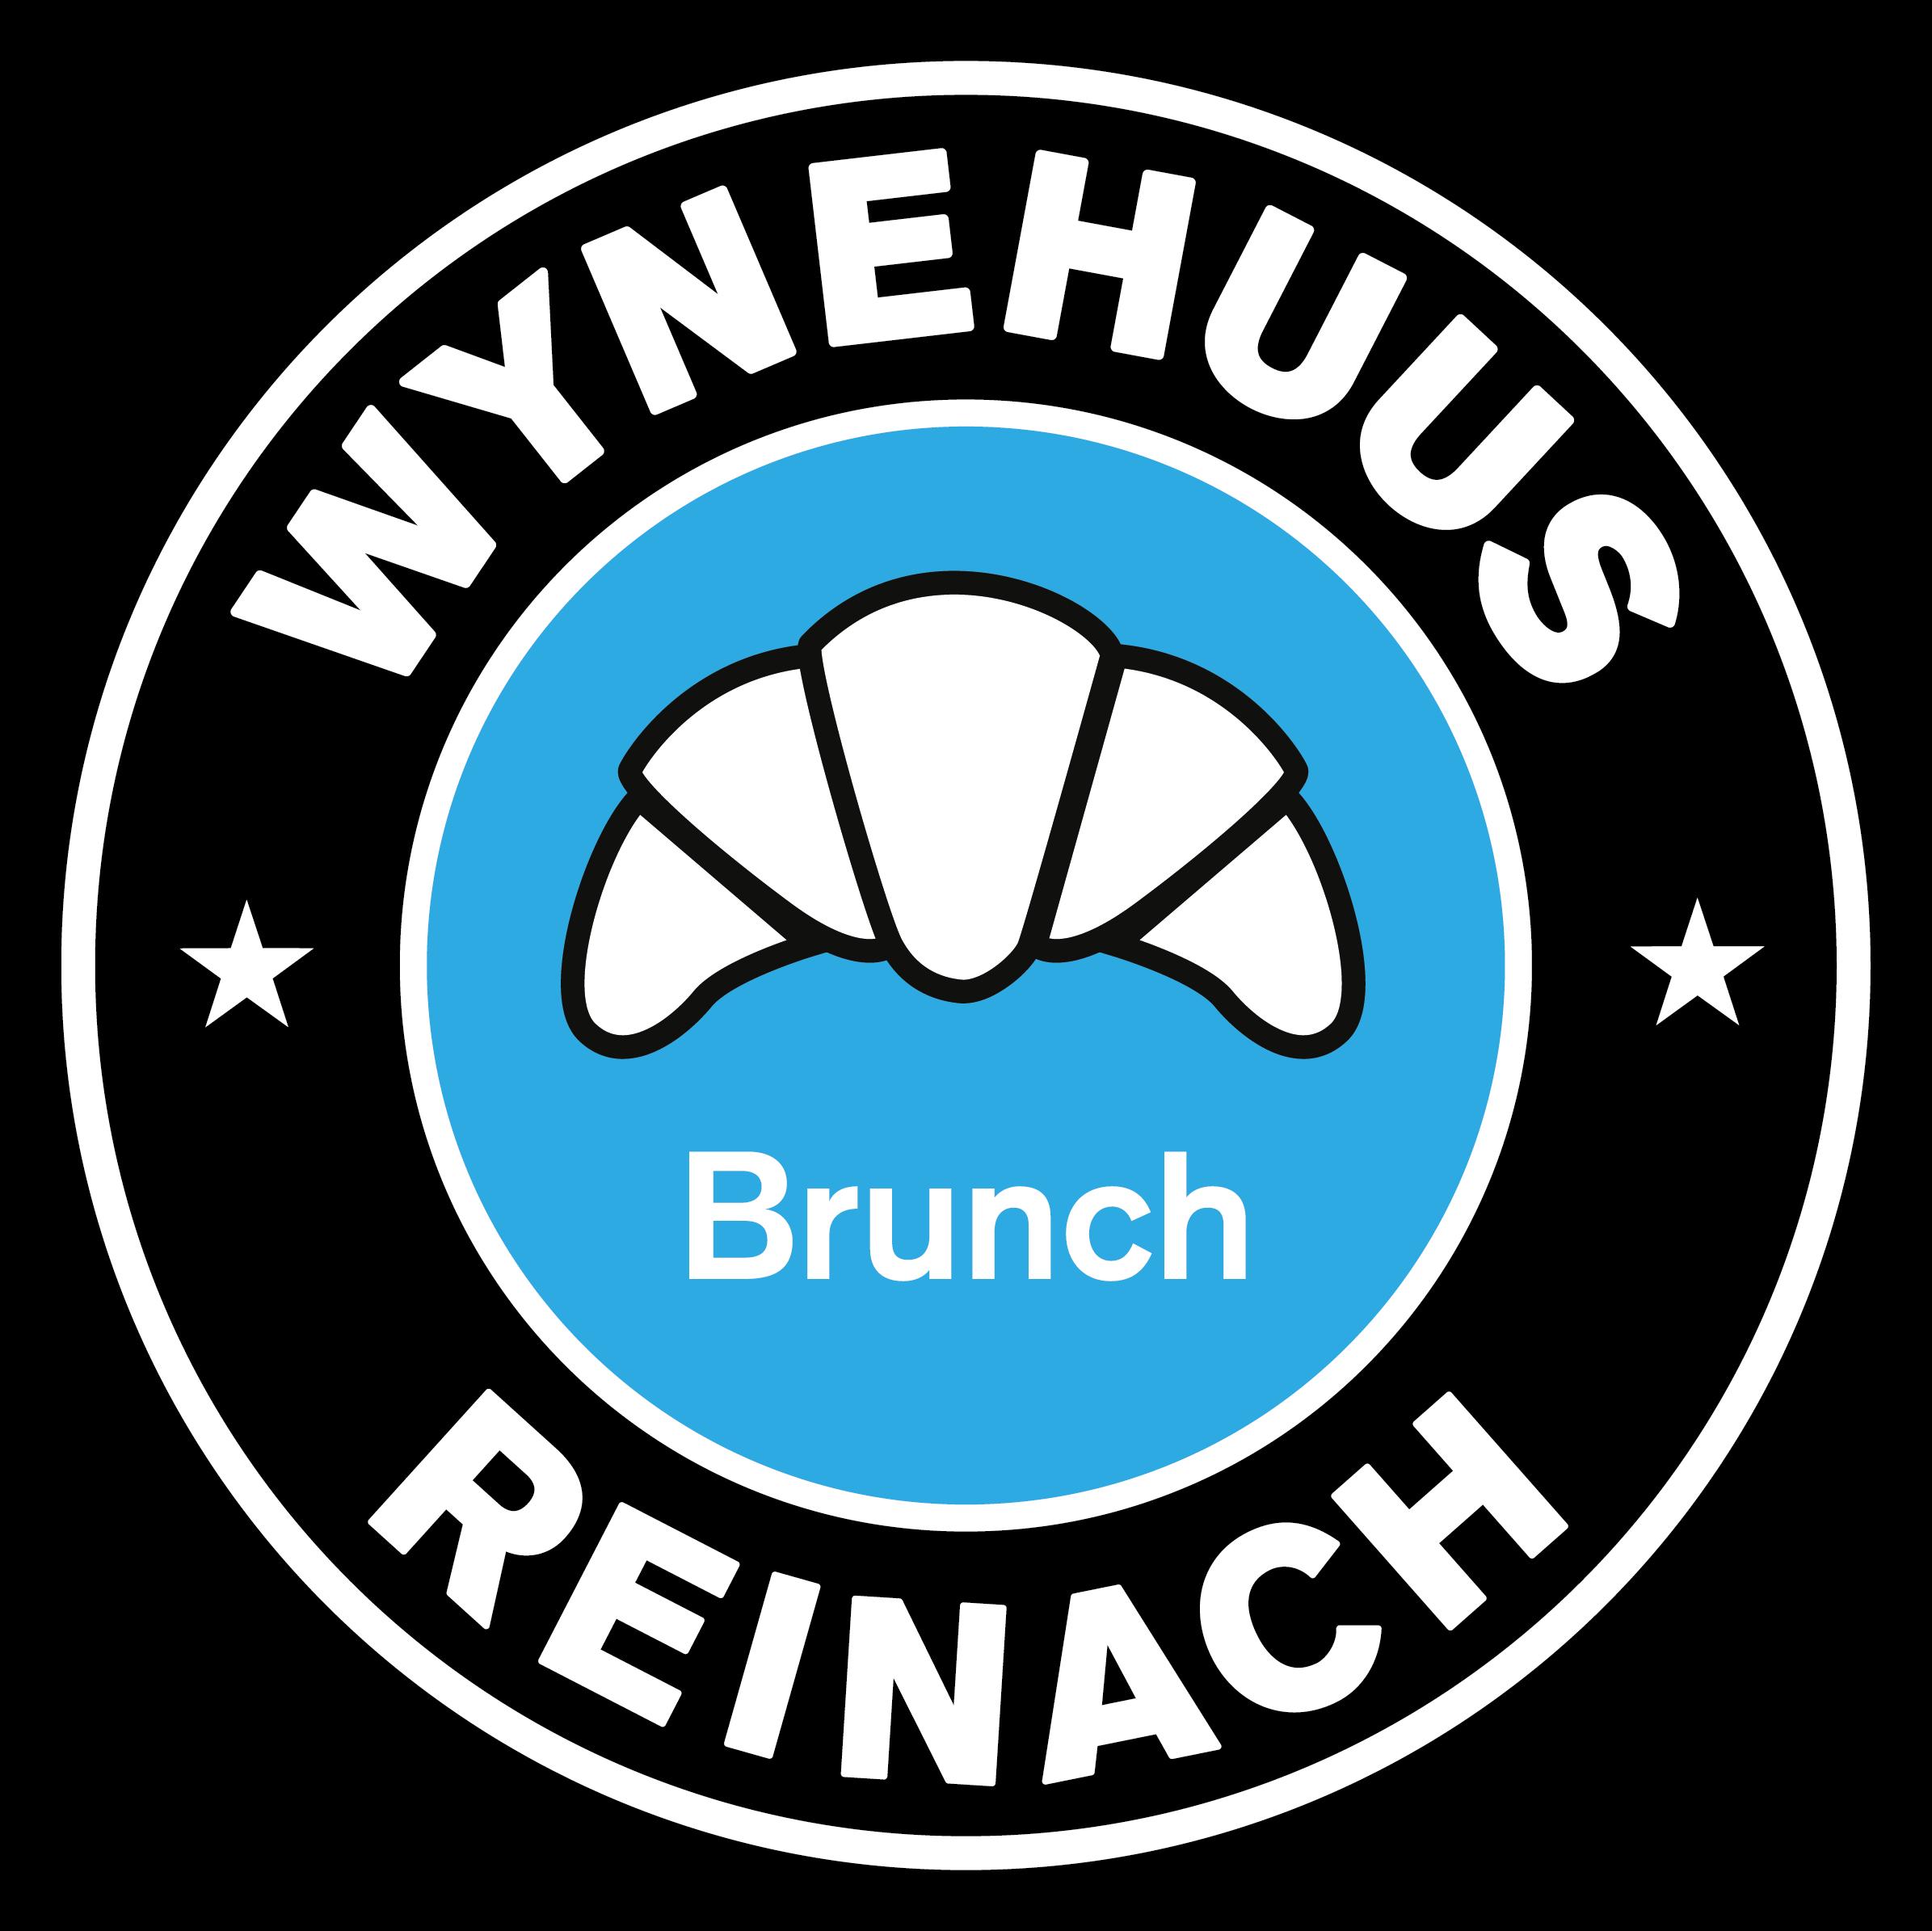 Wynehuus_Brunch